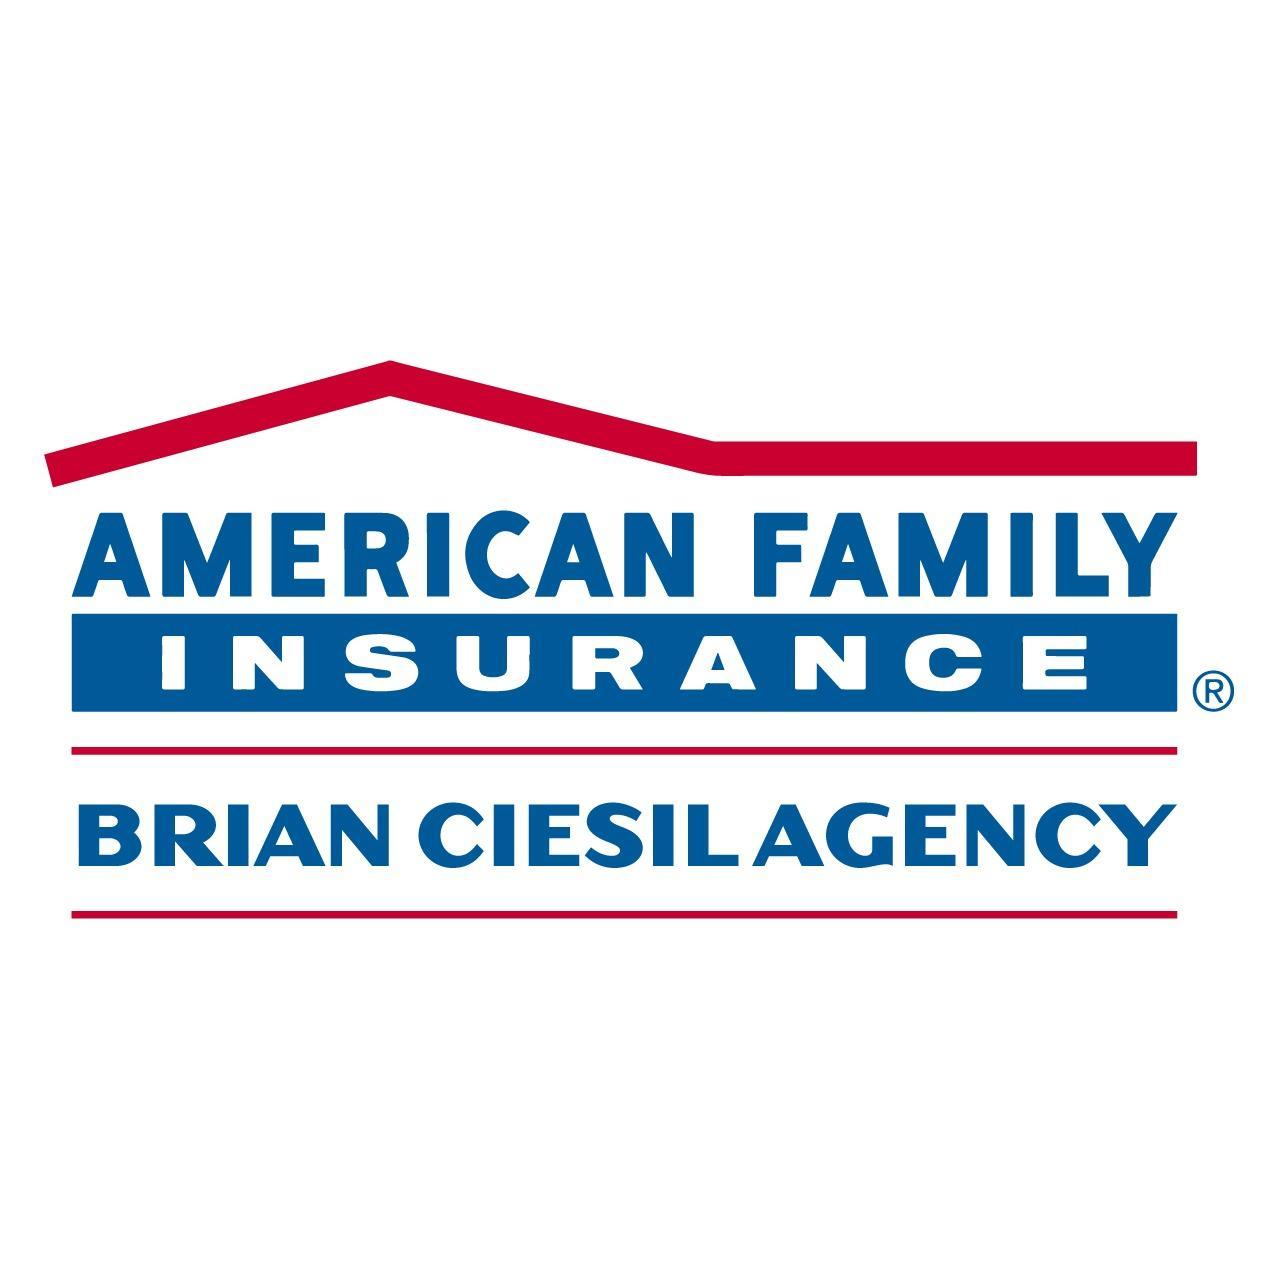 American Family Insurance - Brian Ciesil